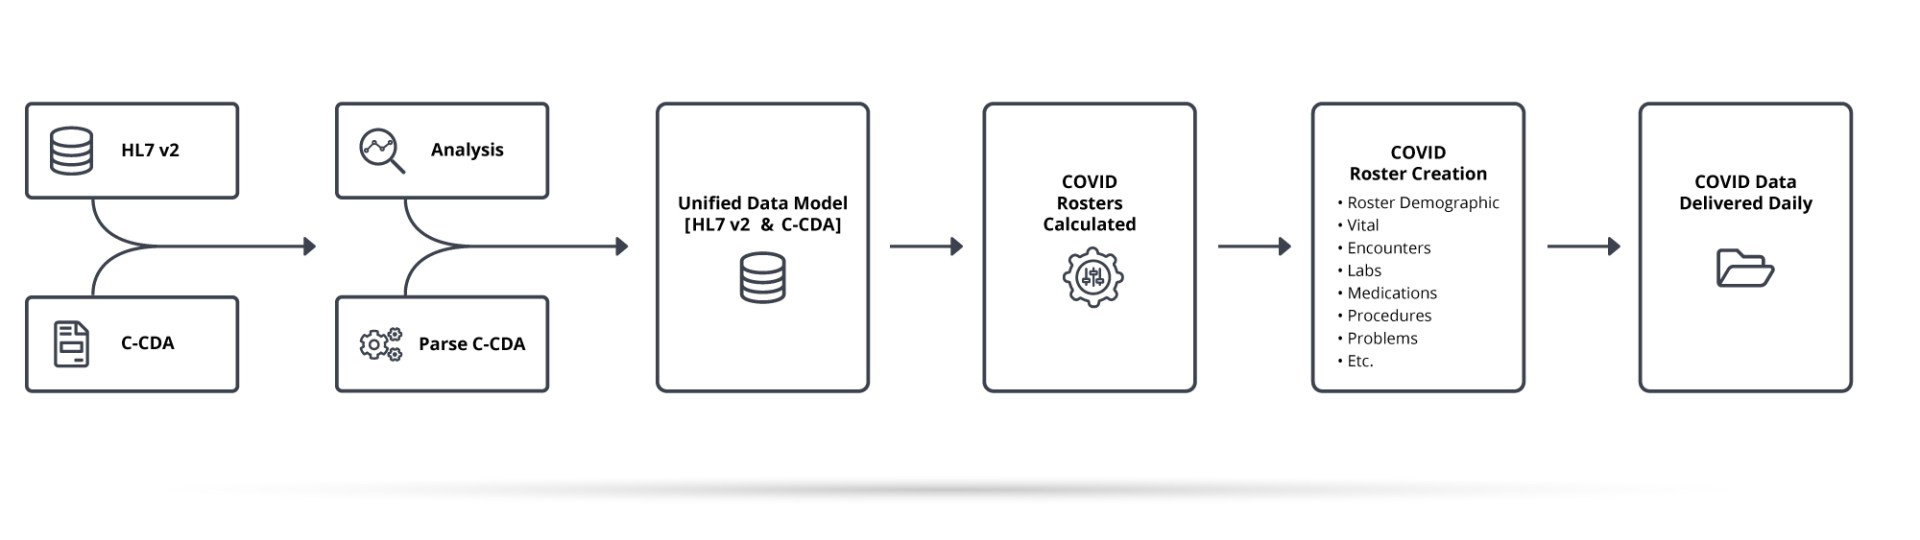 Unified Data Model